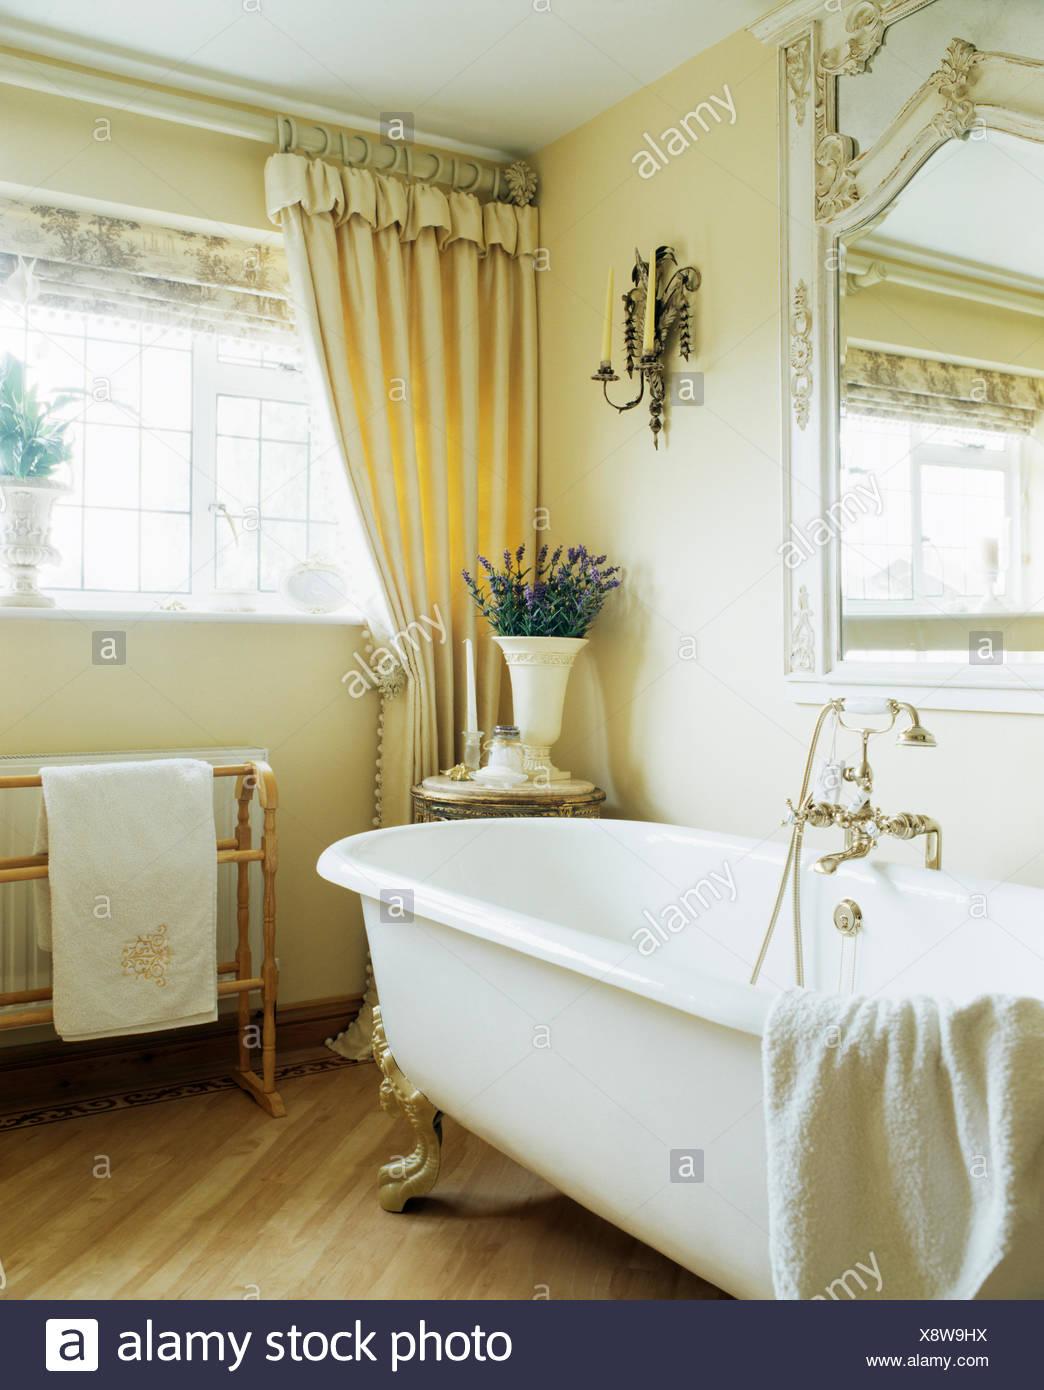 Roll-top bath in cream bathroom with cream curtains on window above ...